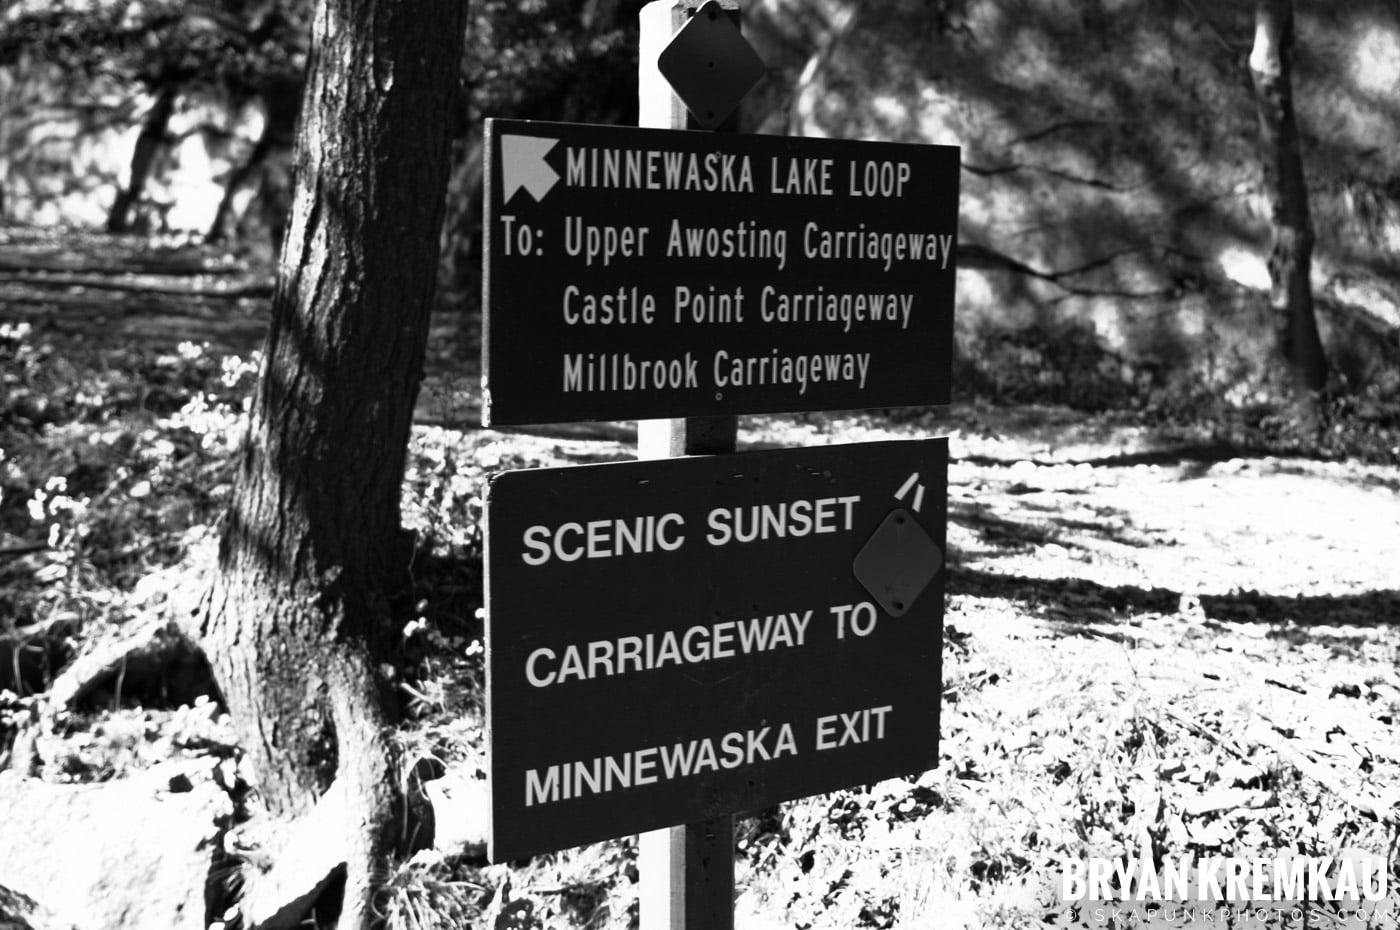 Minnewaska State Park Preserve @ Wawarsing, New York - 10.22.11 (11)